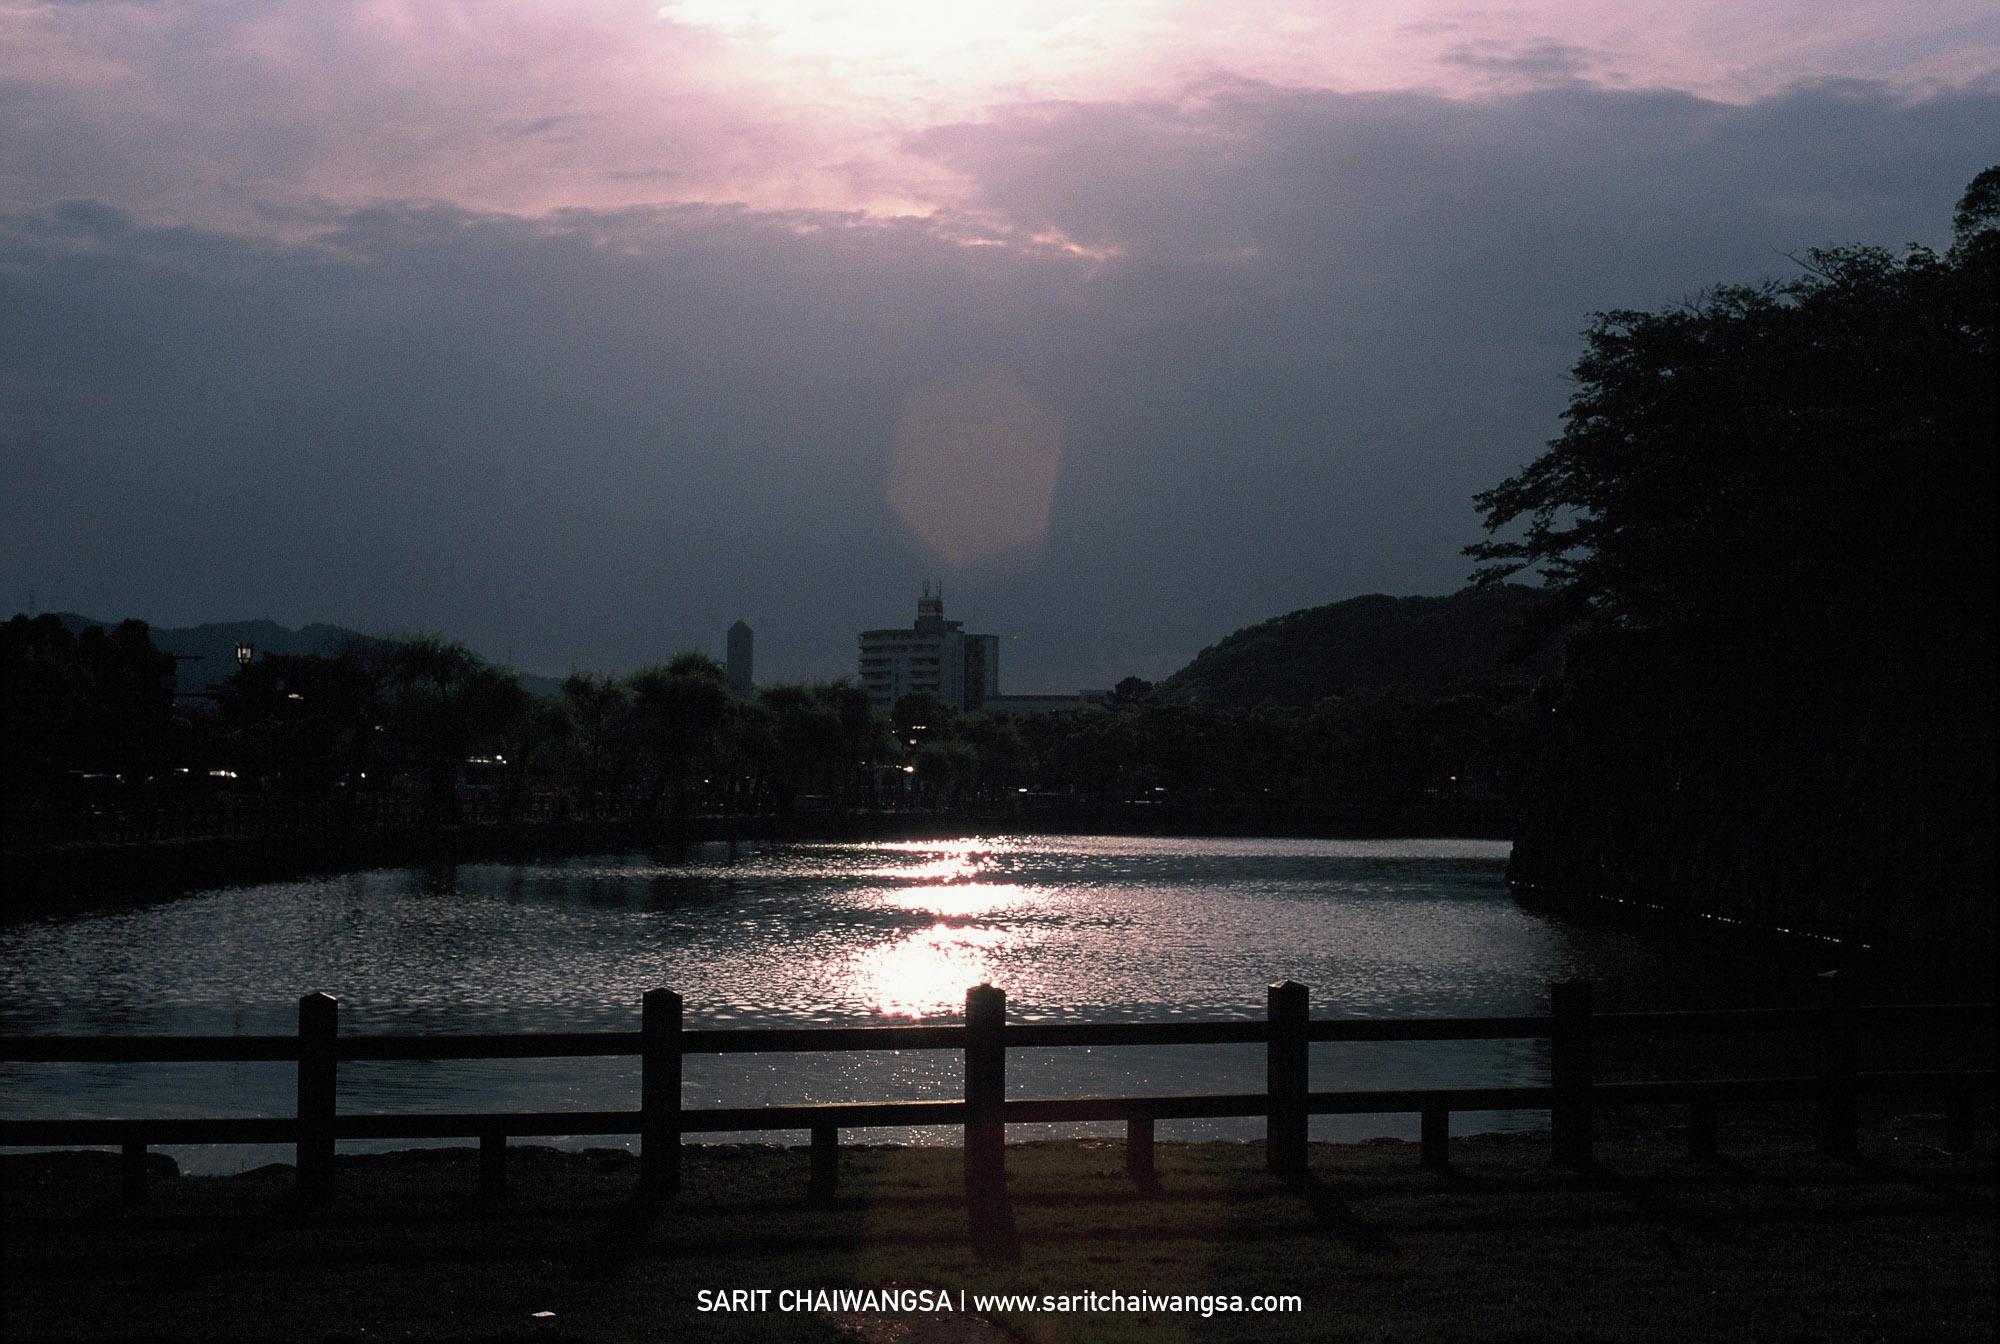 sarit chaiwangsa minolta srt 101 agfa photo himeji castle 3